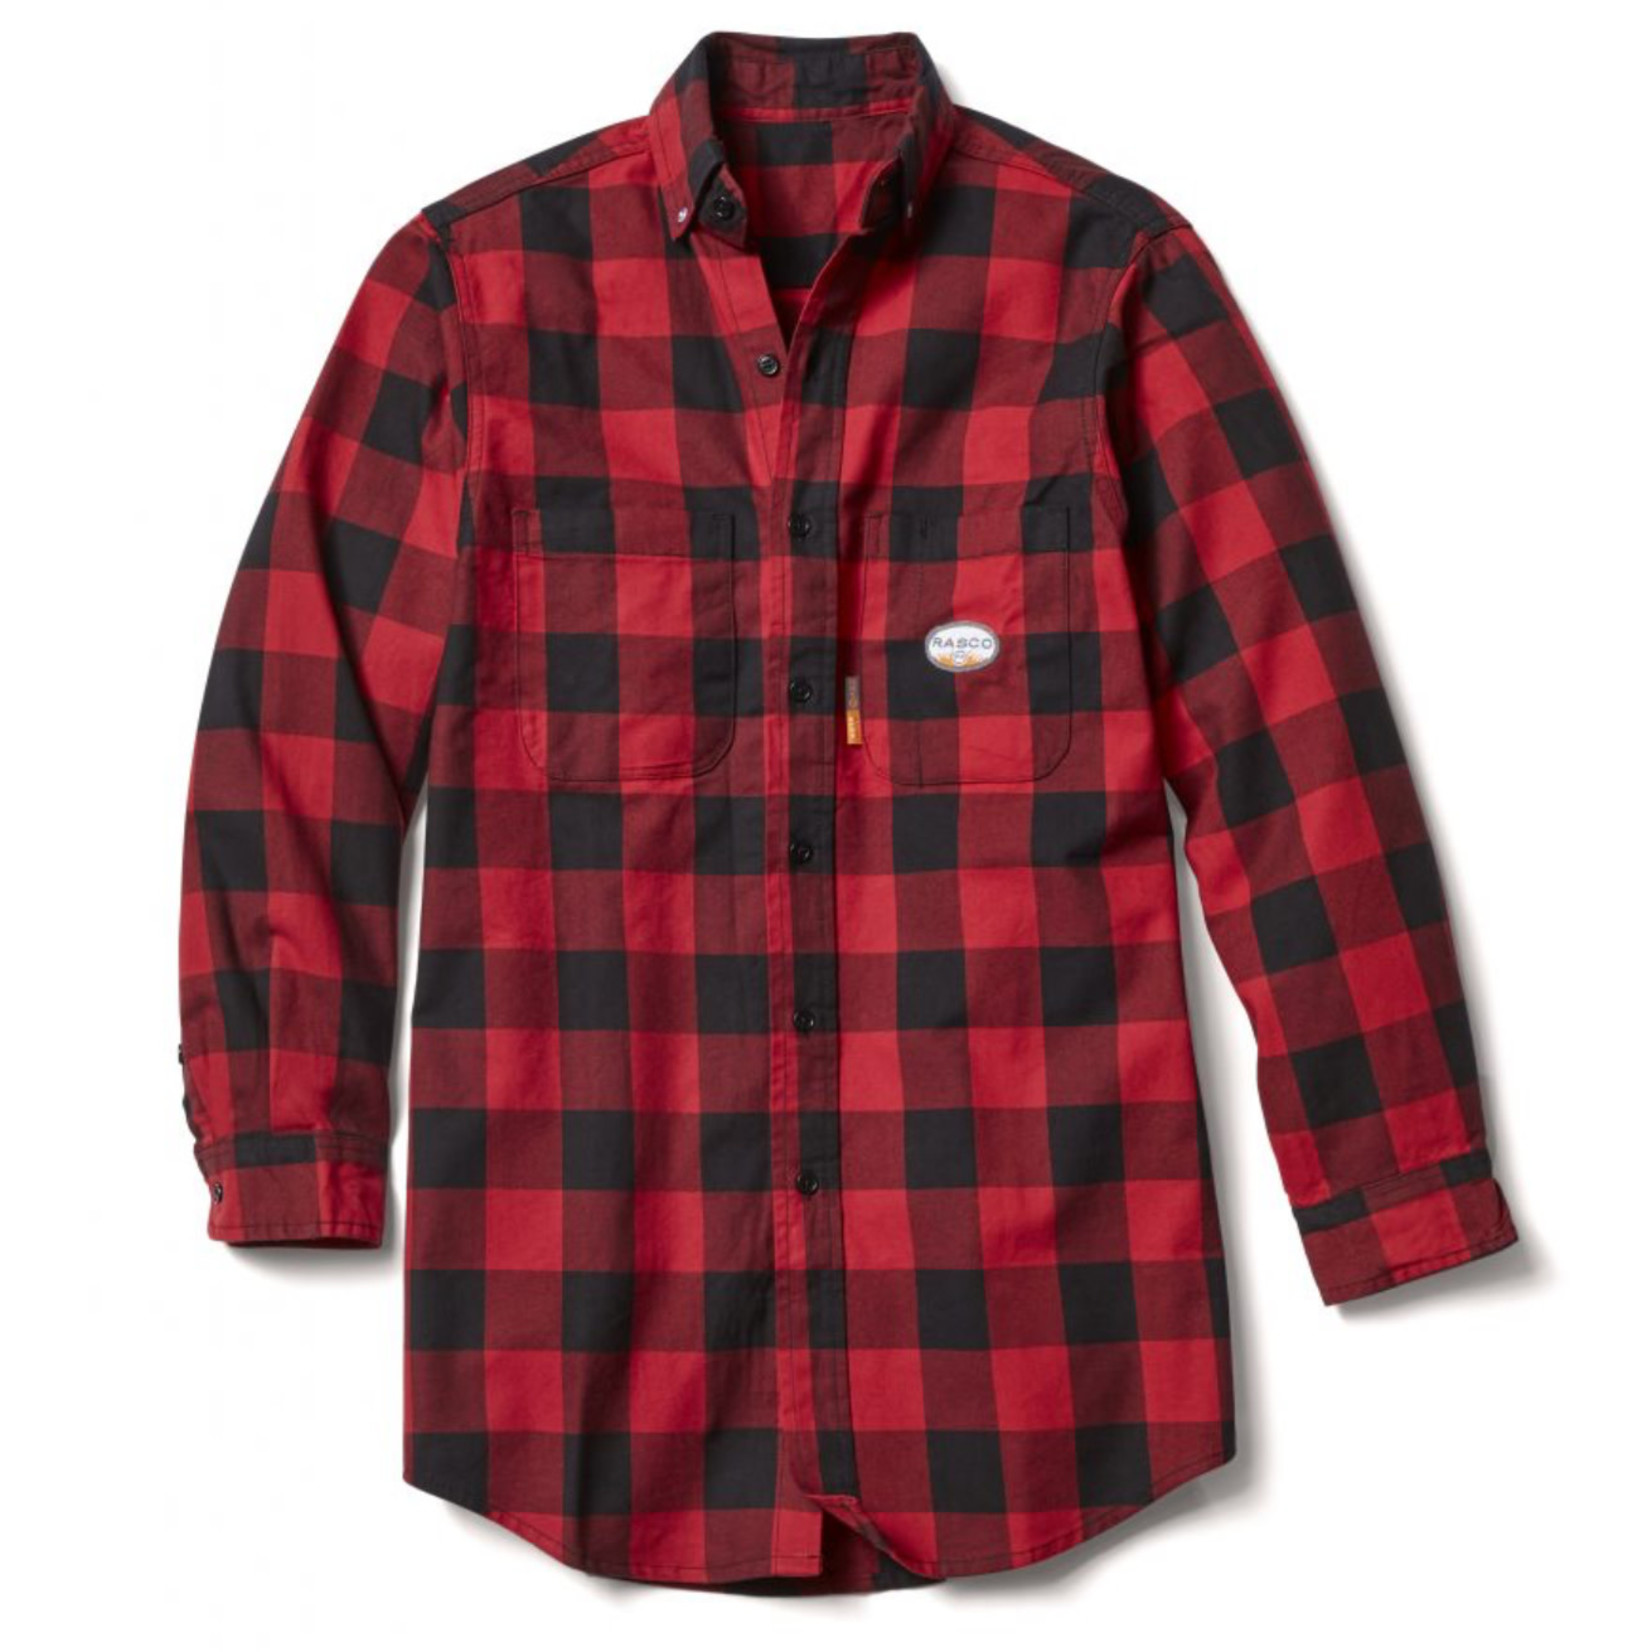 Rasco Rasco FR0824RD/BK Red & Blue Buffalo Plaid FR 7.7 oz Button Up Shirt